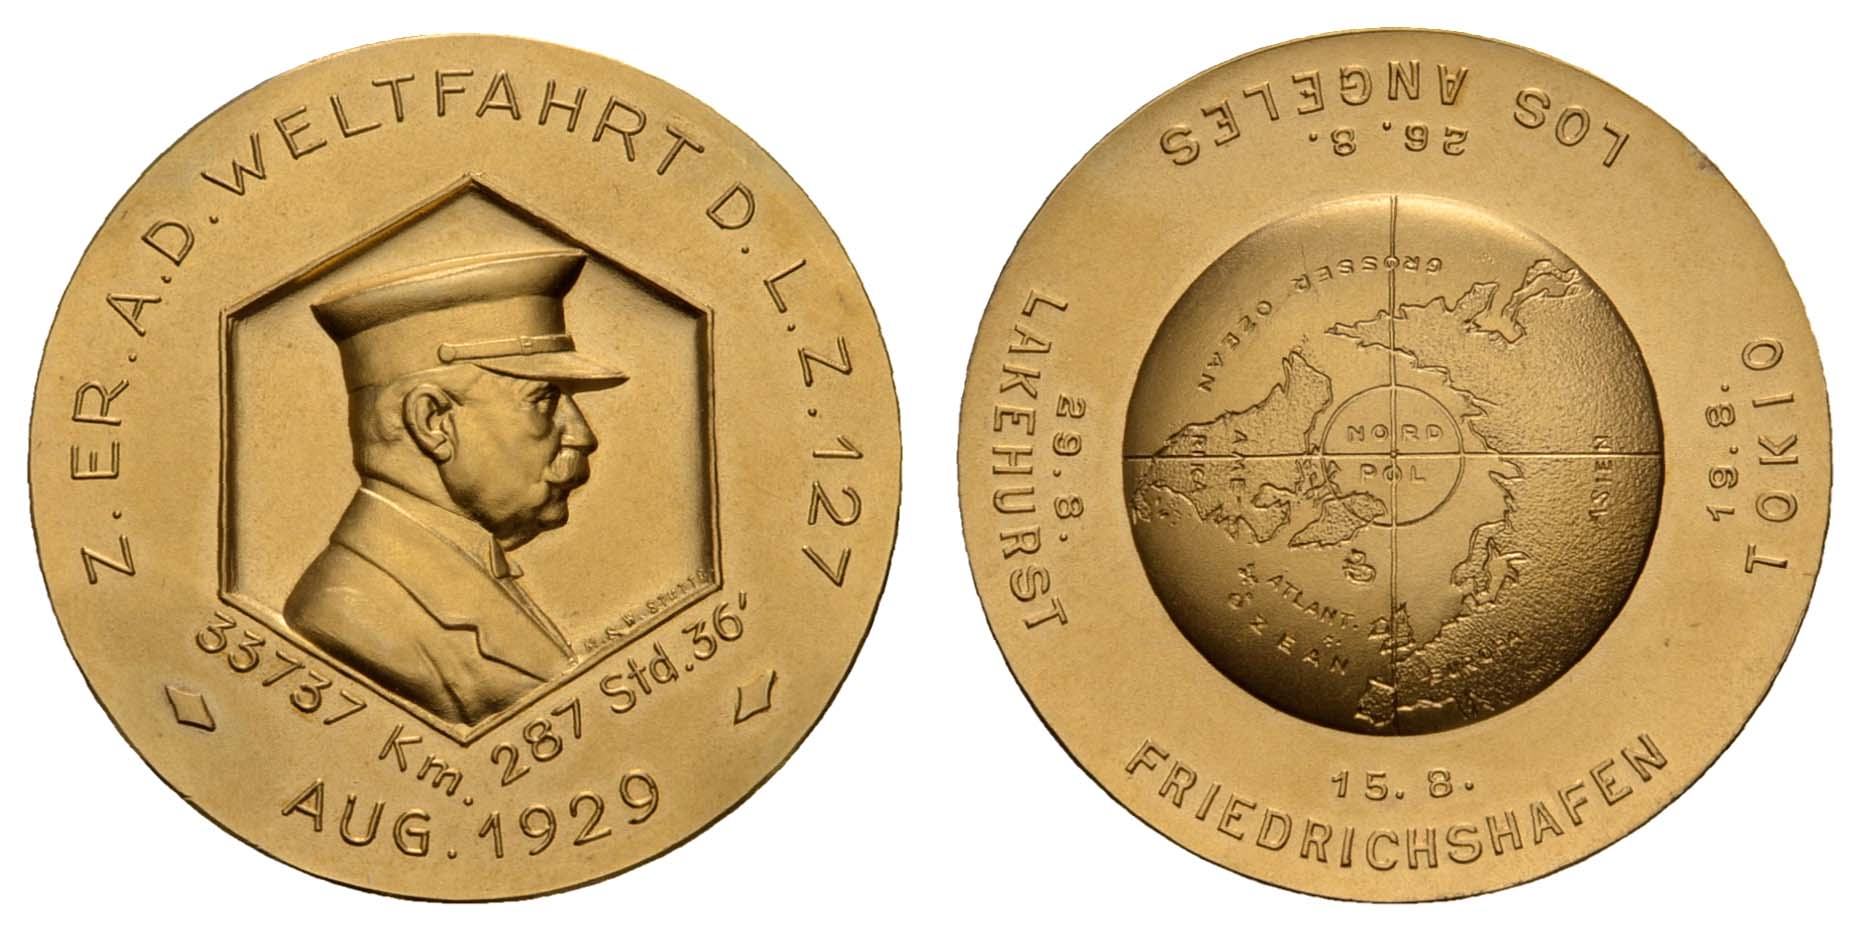 Lot 2341 - medaillen Sonstige Medaillen - Zeppelin -  Auktionshaus Ulrich Felzmann GmbH & Co. KG Coins single lots